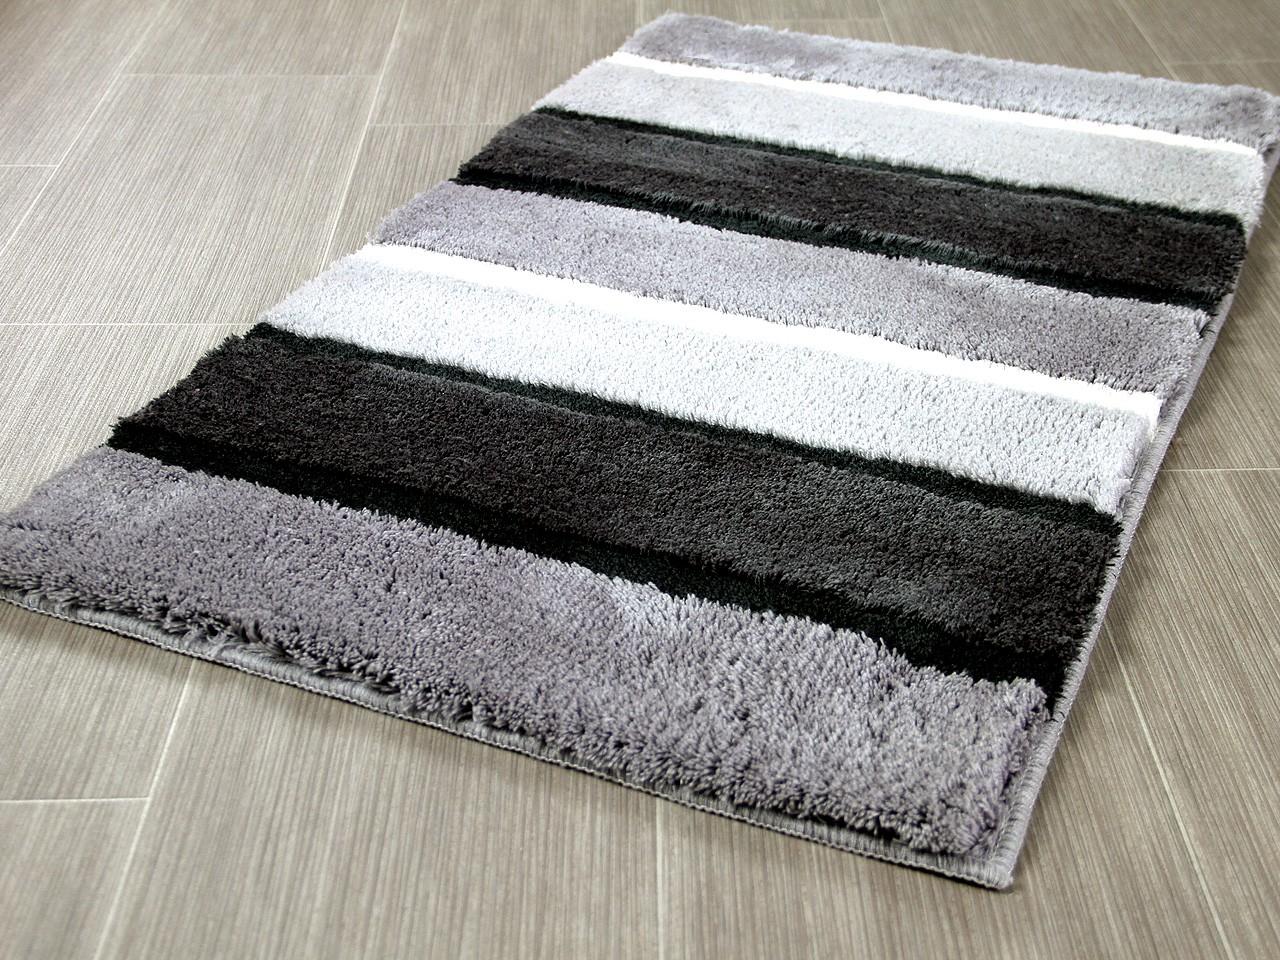 Badezimmerteppich Grau Weiss